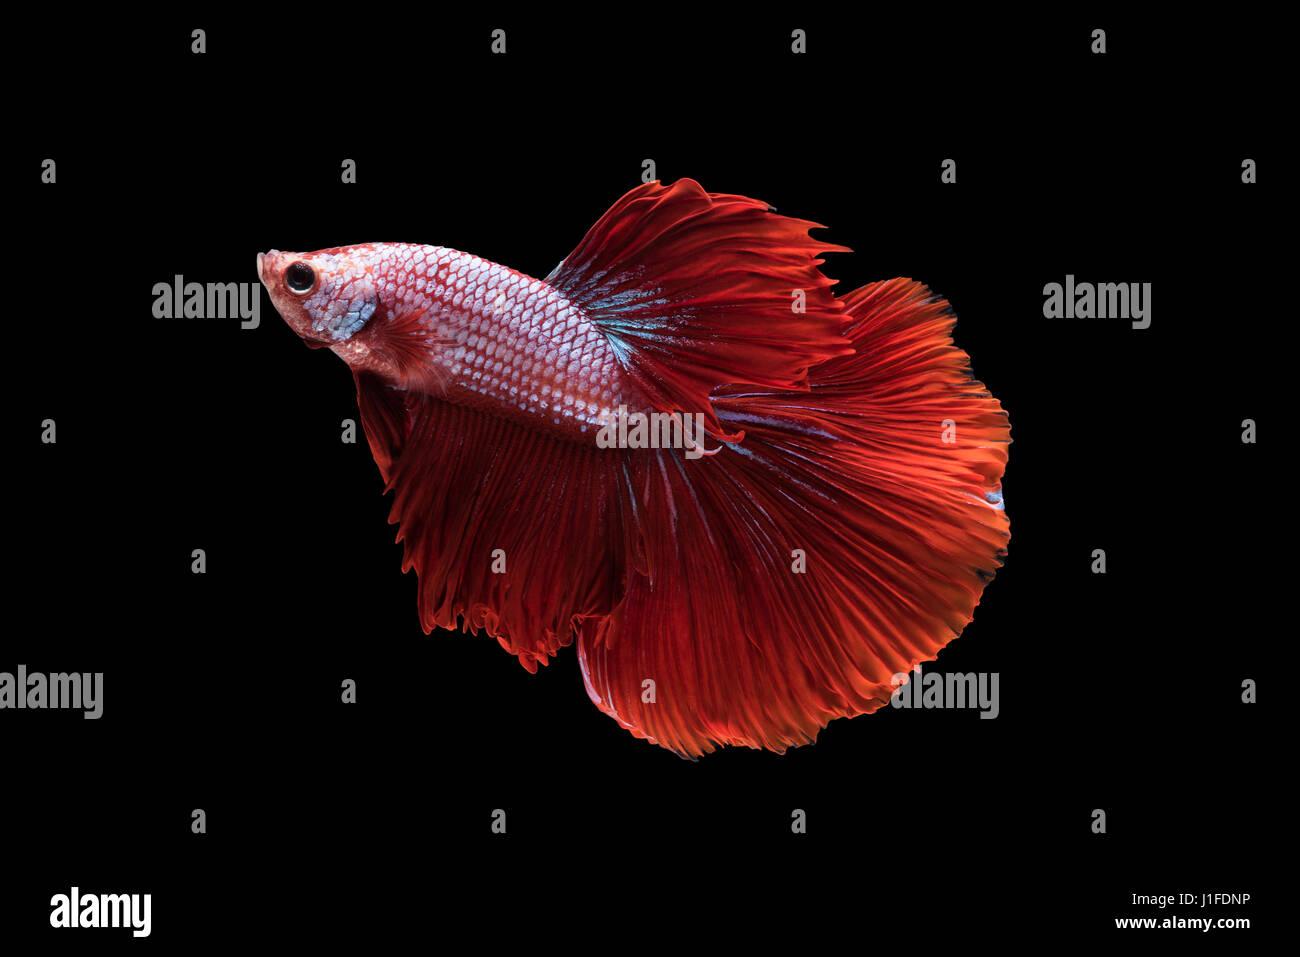 red halfmoon betta splendens or siamese fighting fish isolated on